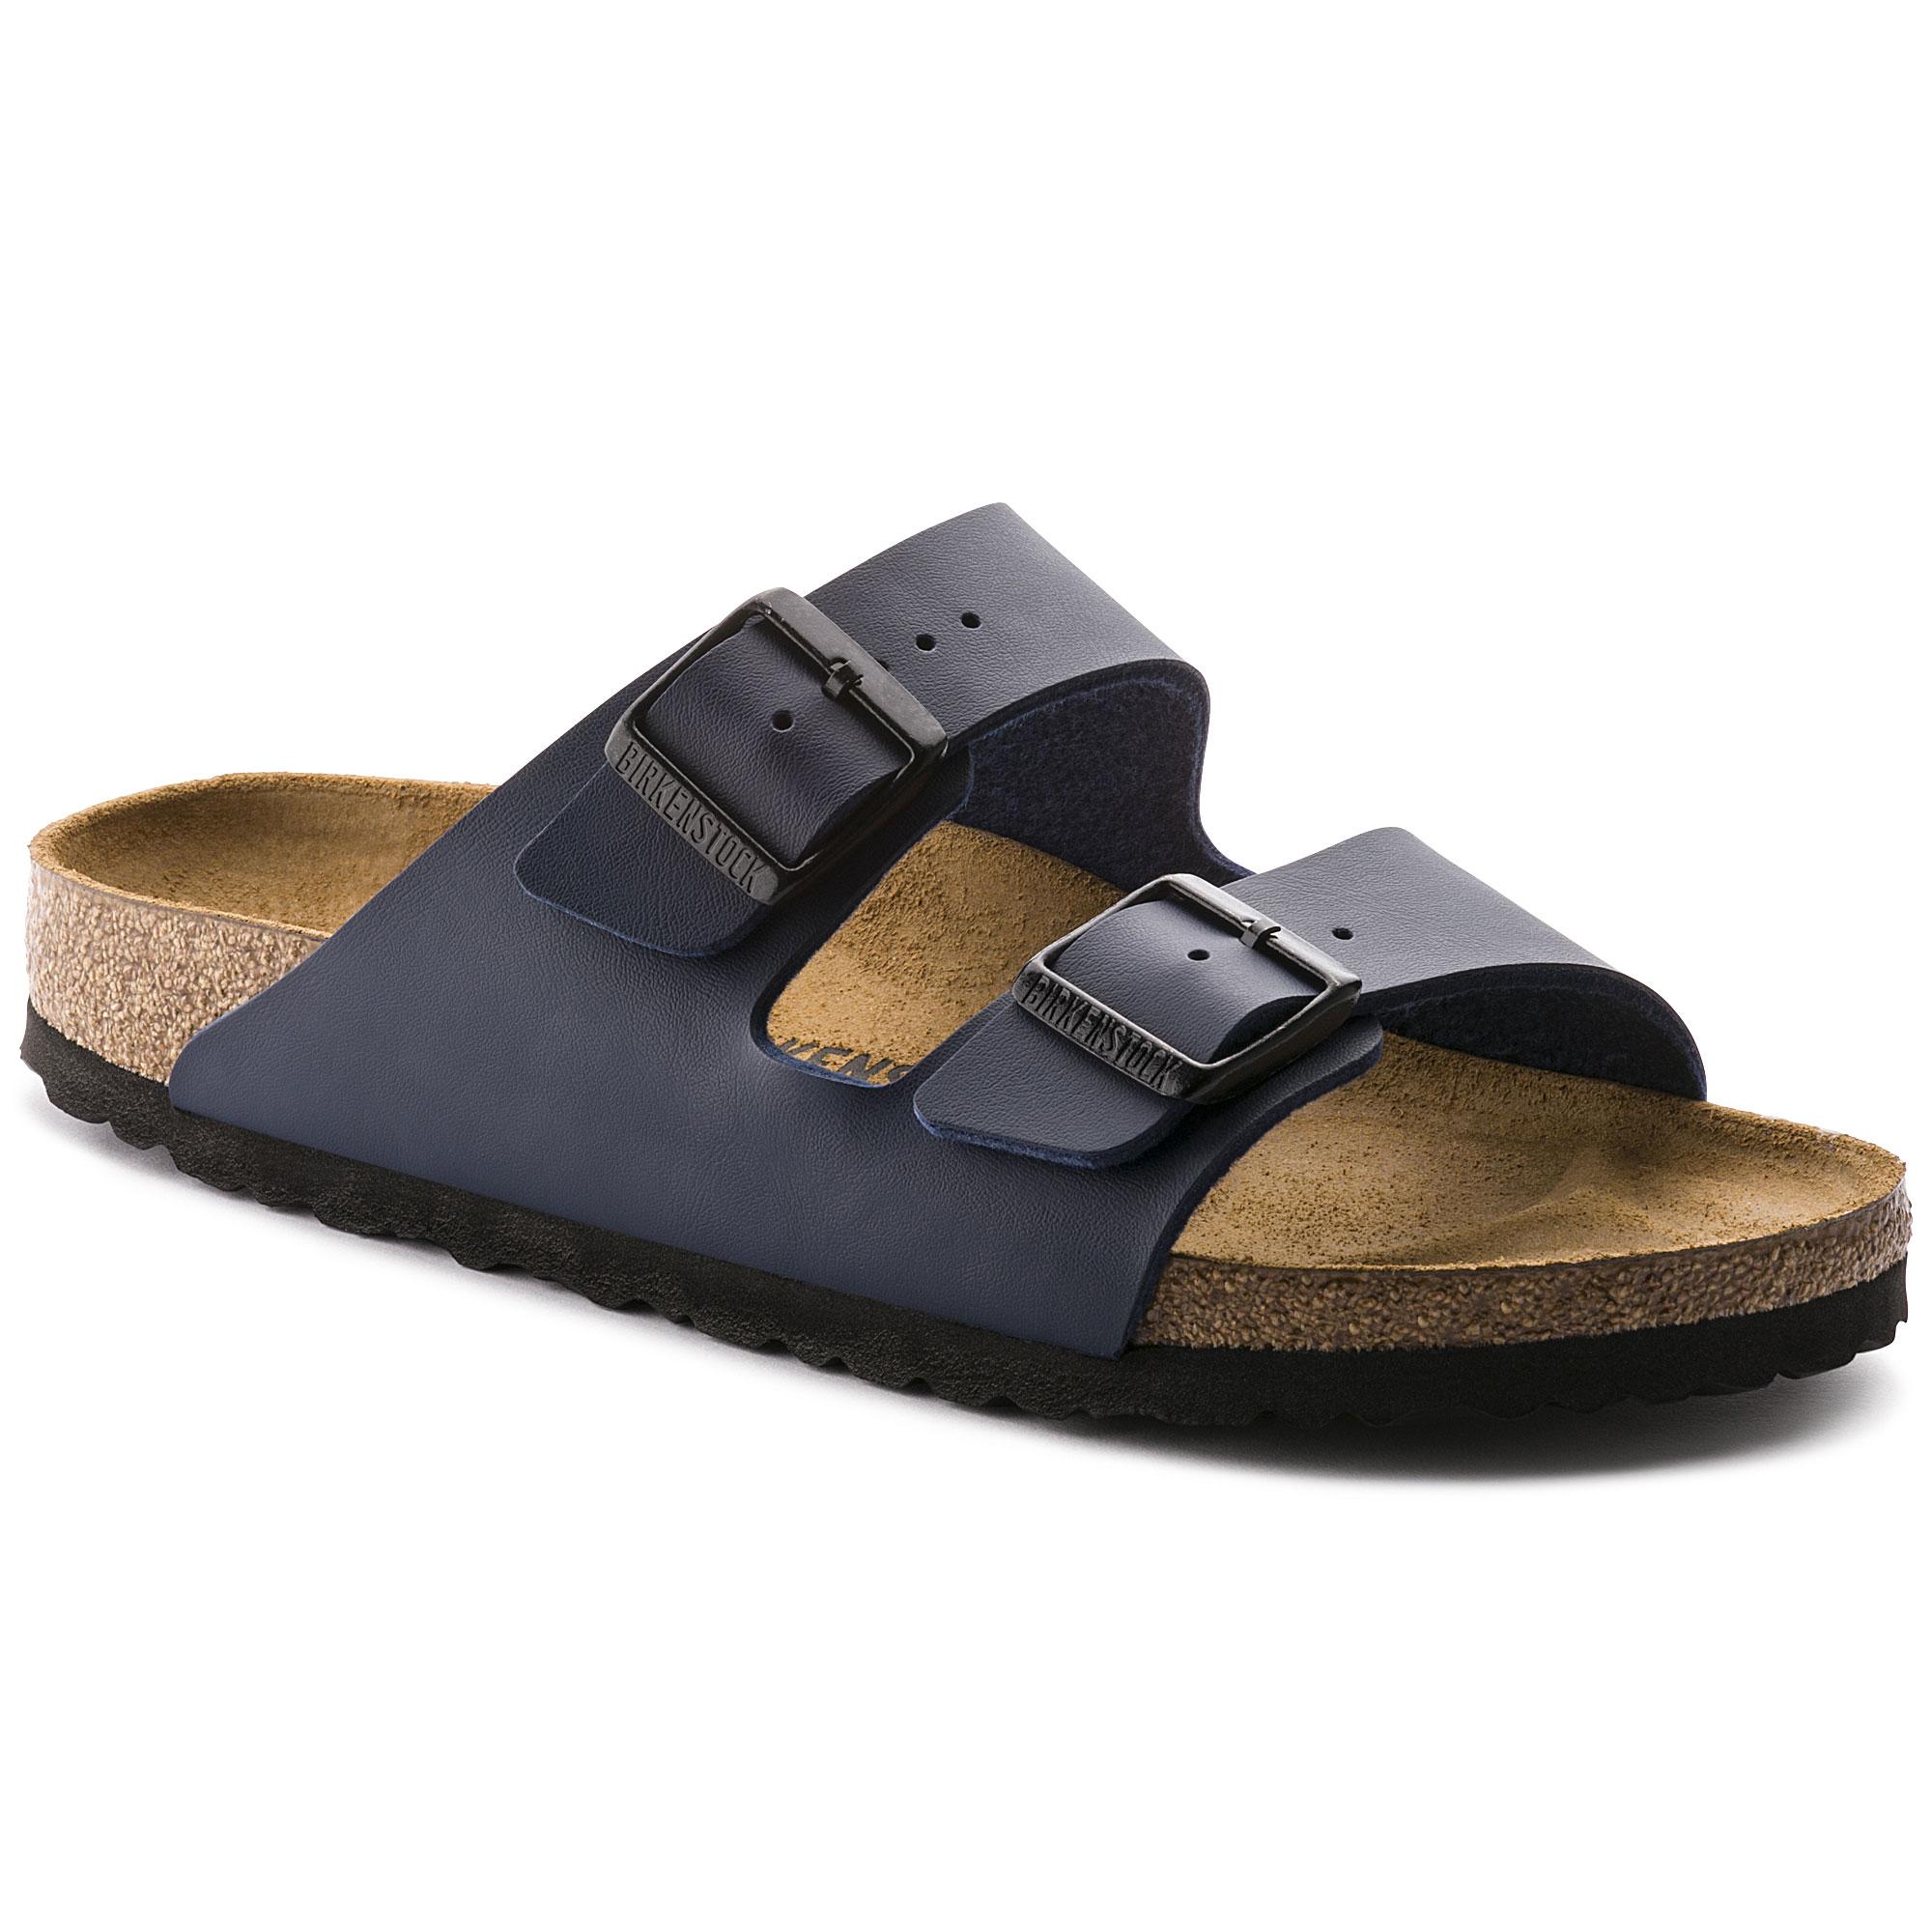 Birkenstock Arizona blue sandals 39 8 regular NWT